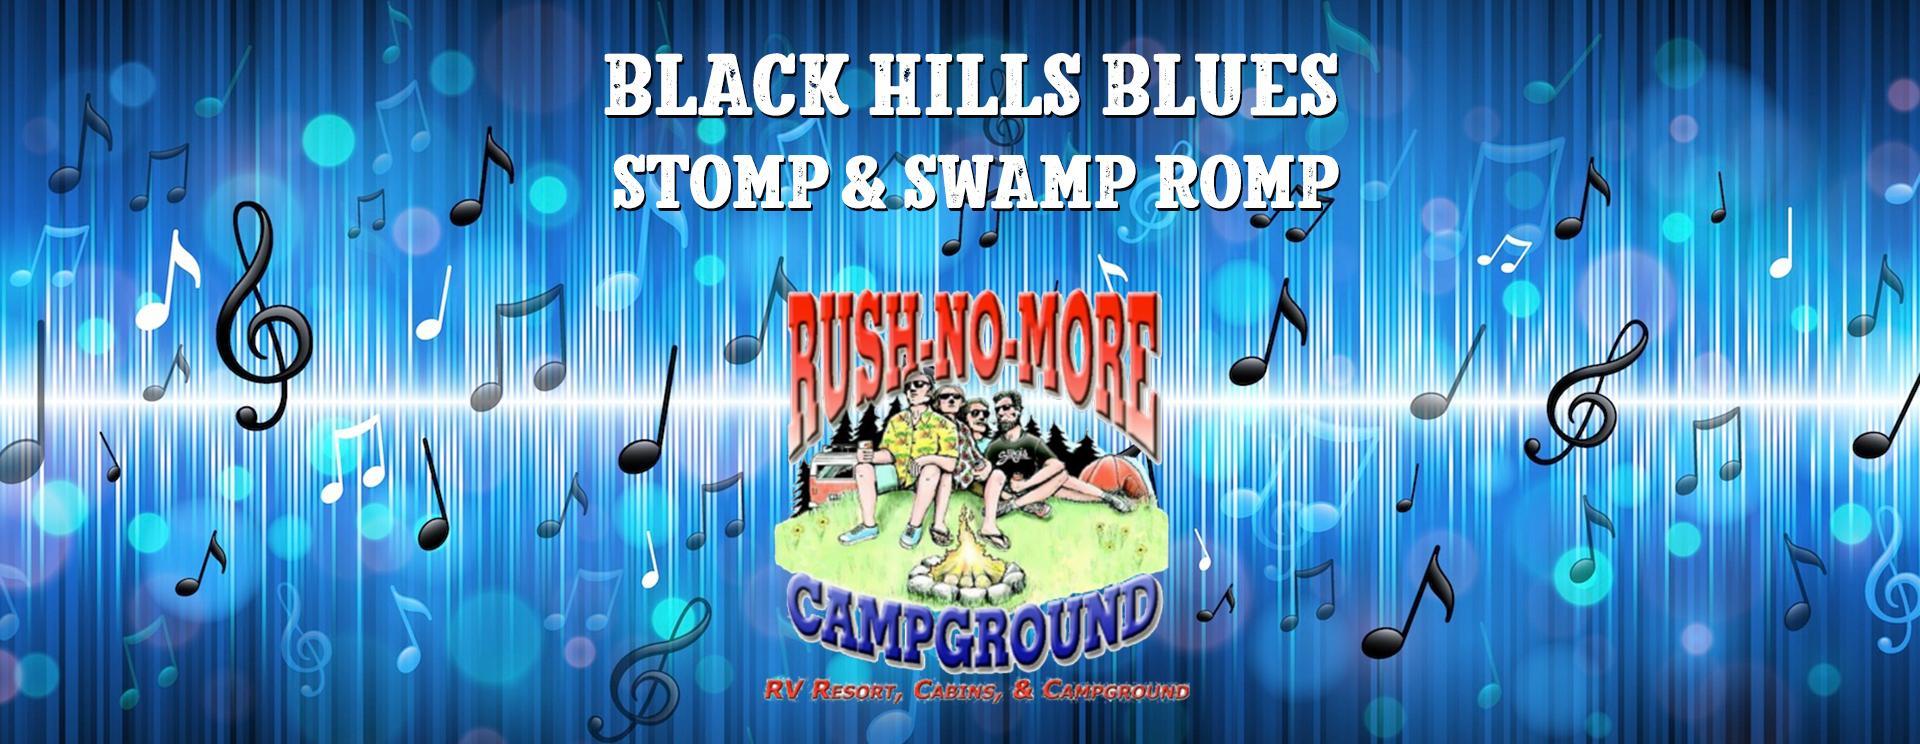 Black Hills Blues Stomp & Swamp Romp